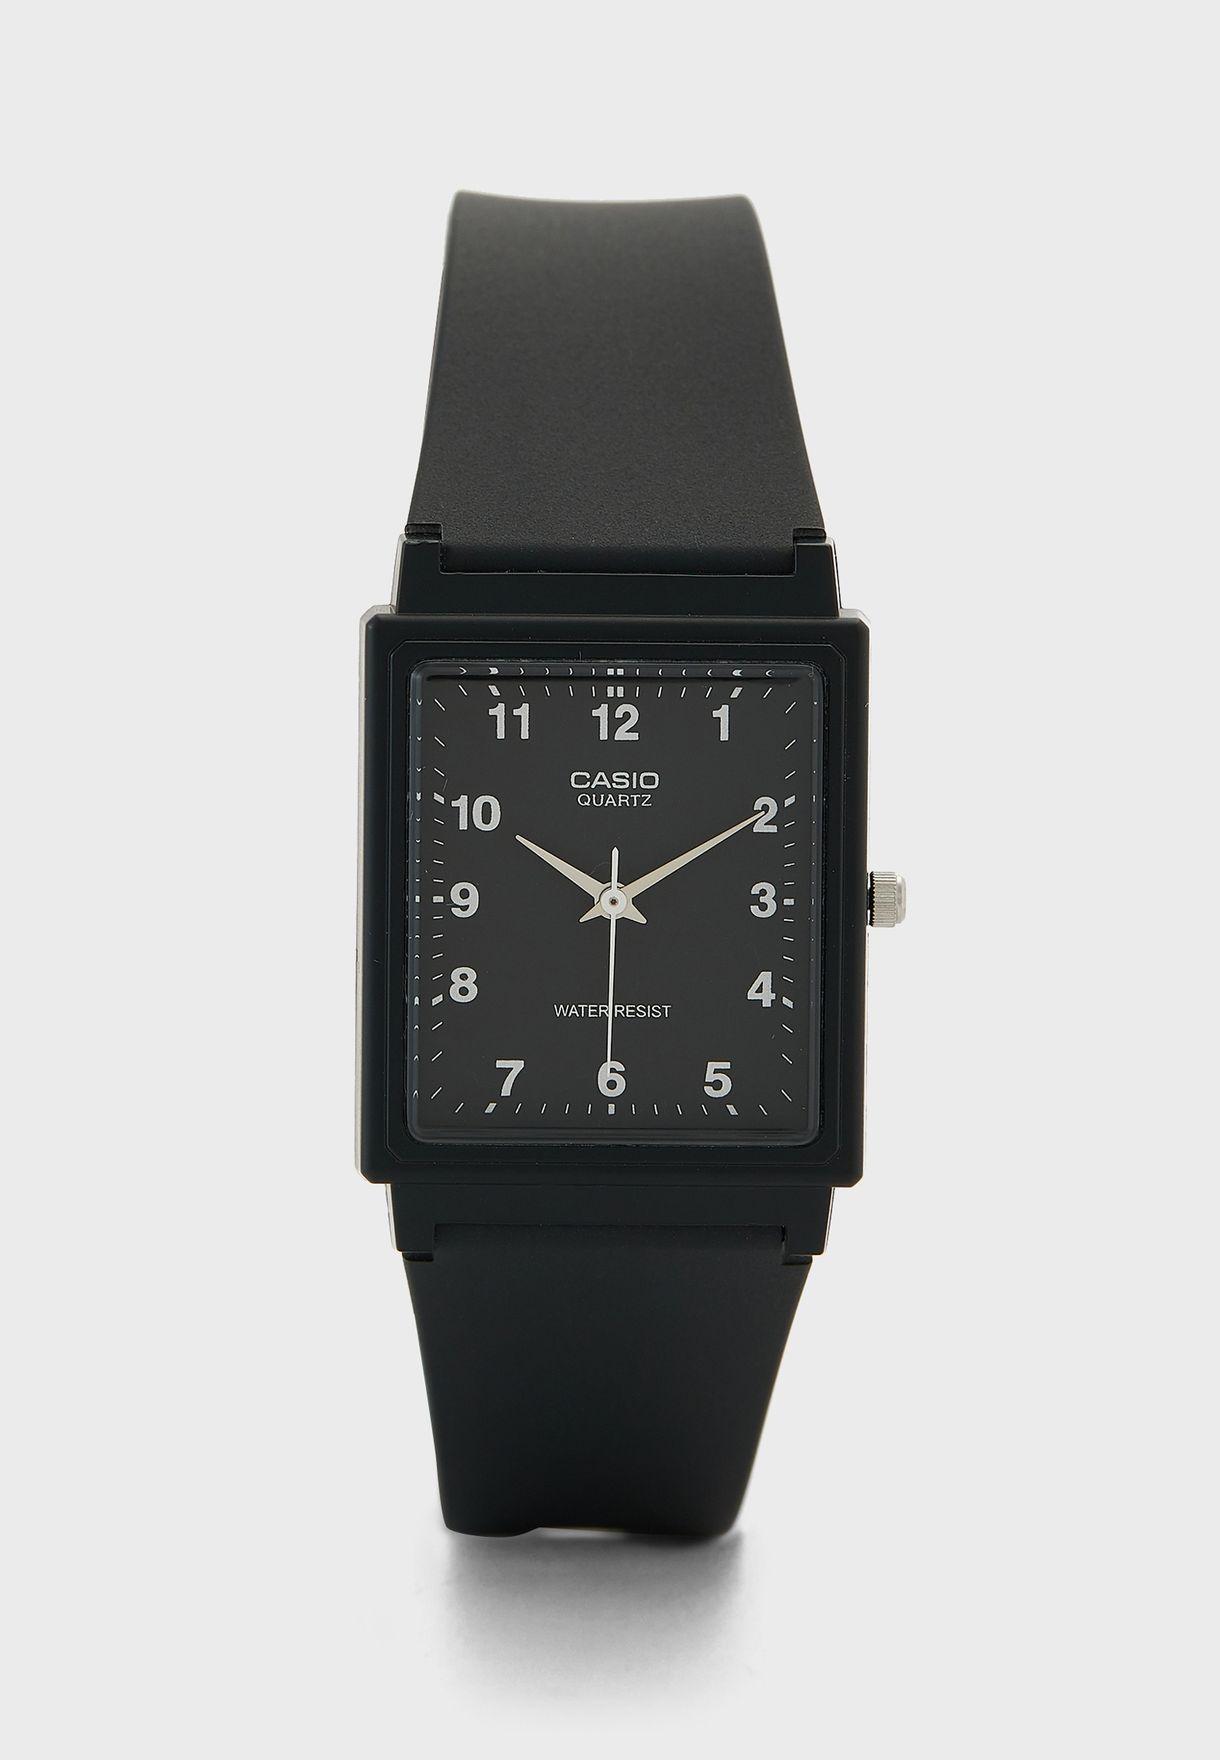 Casio Quartz Watch with Resin Strap